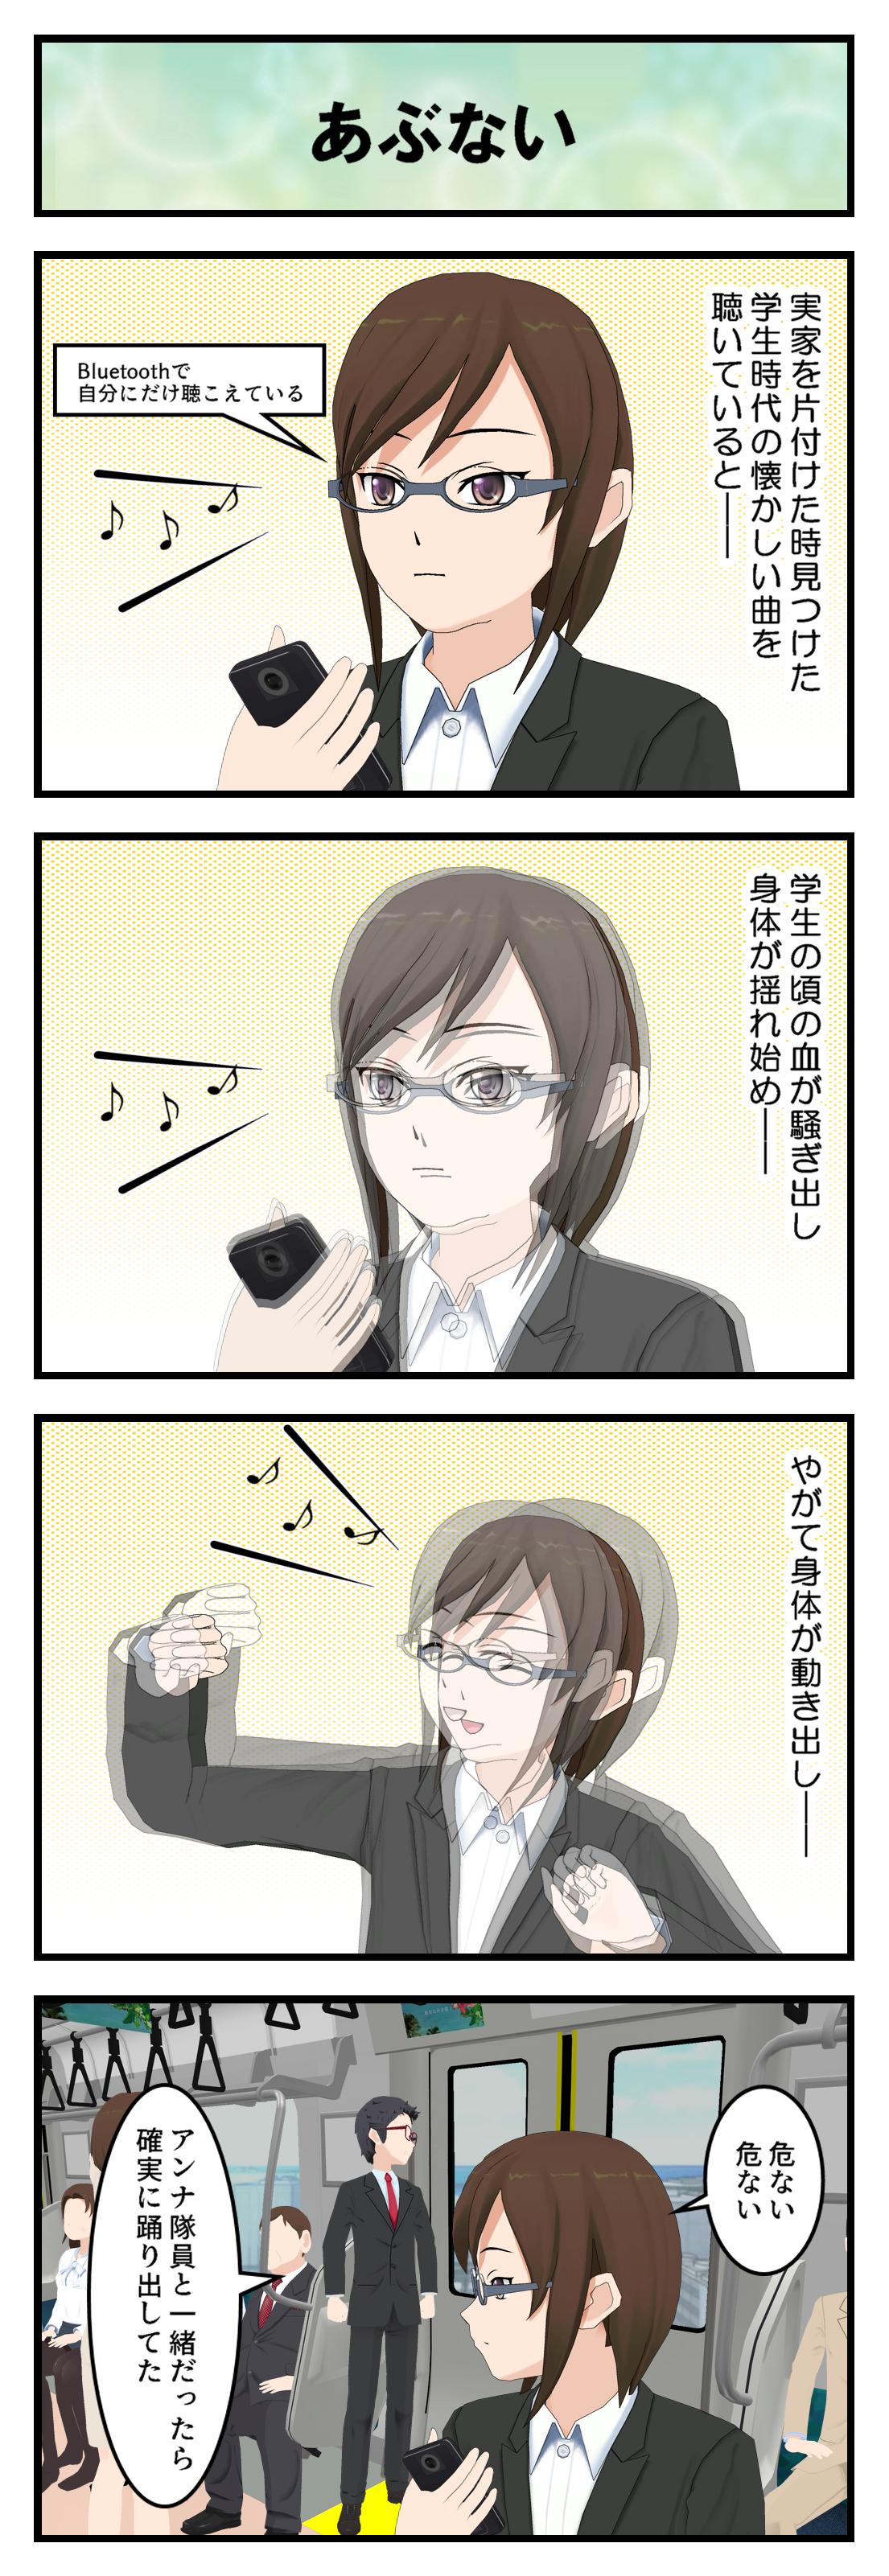 Q199_電車踊り_001